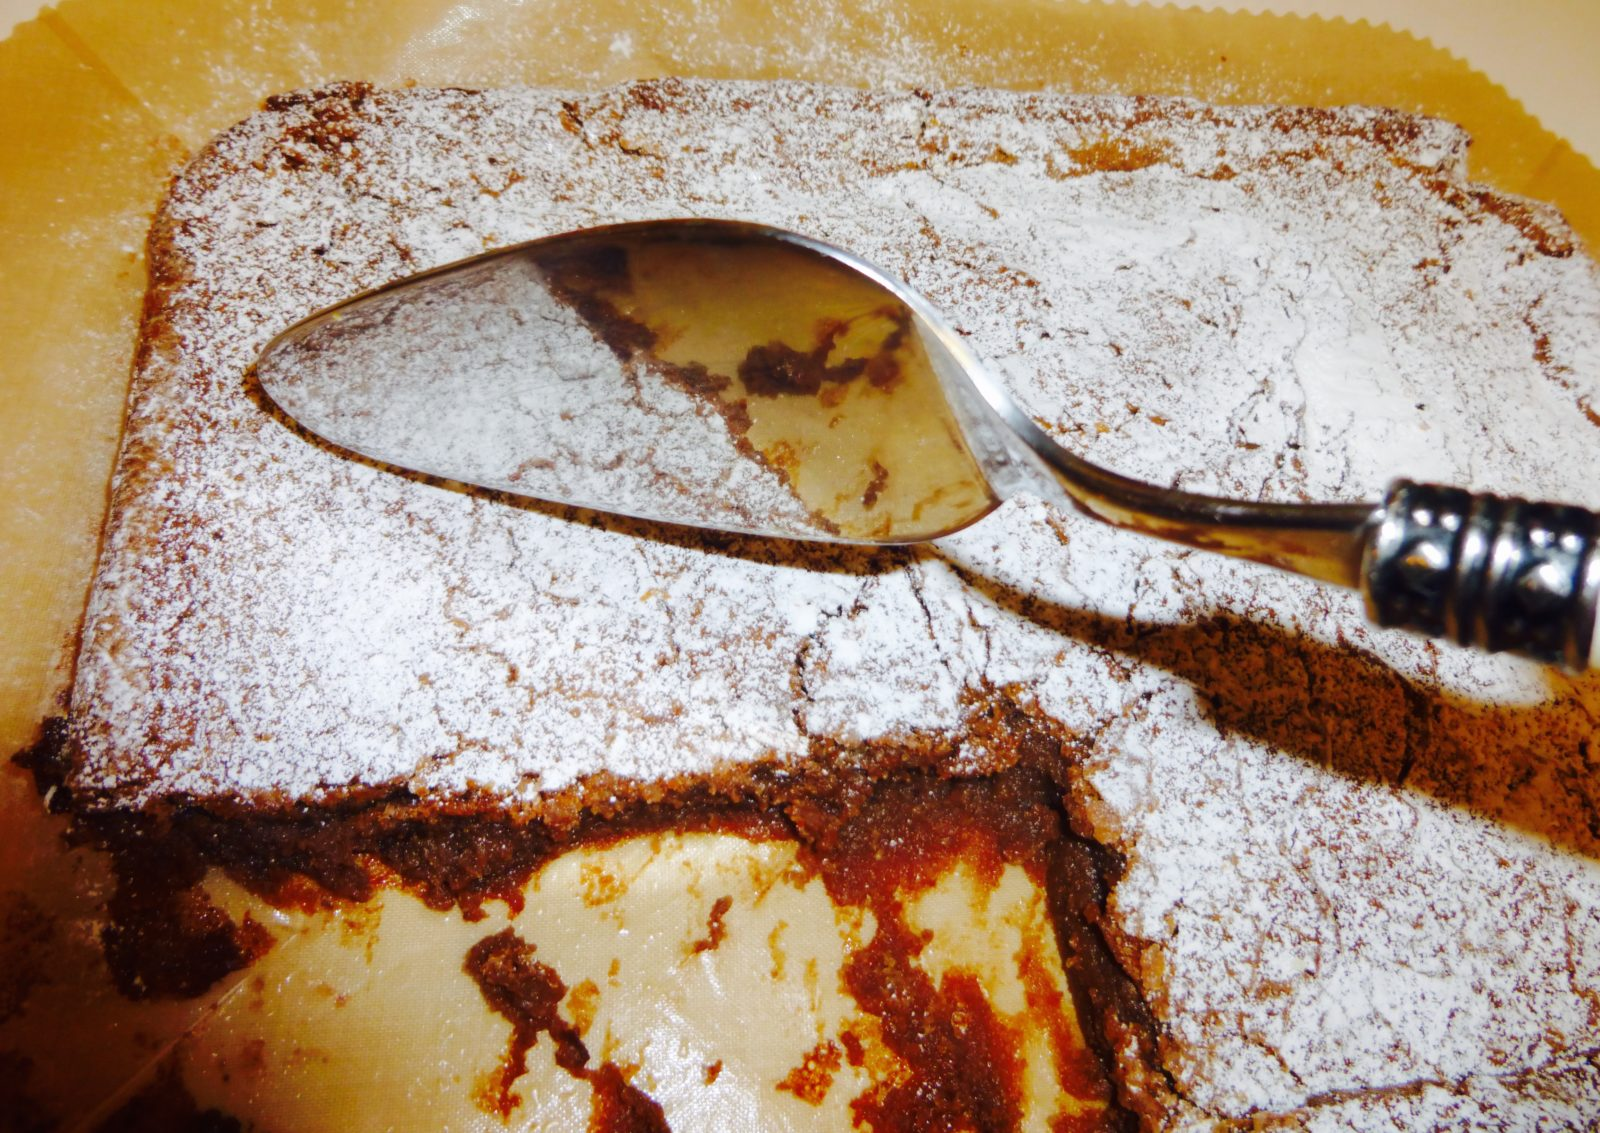 It's a Flourless Chocolate Torte Cake!